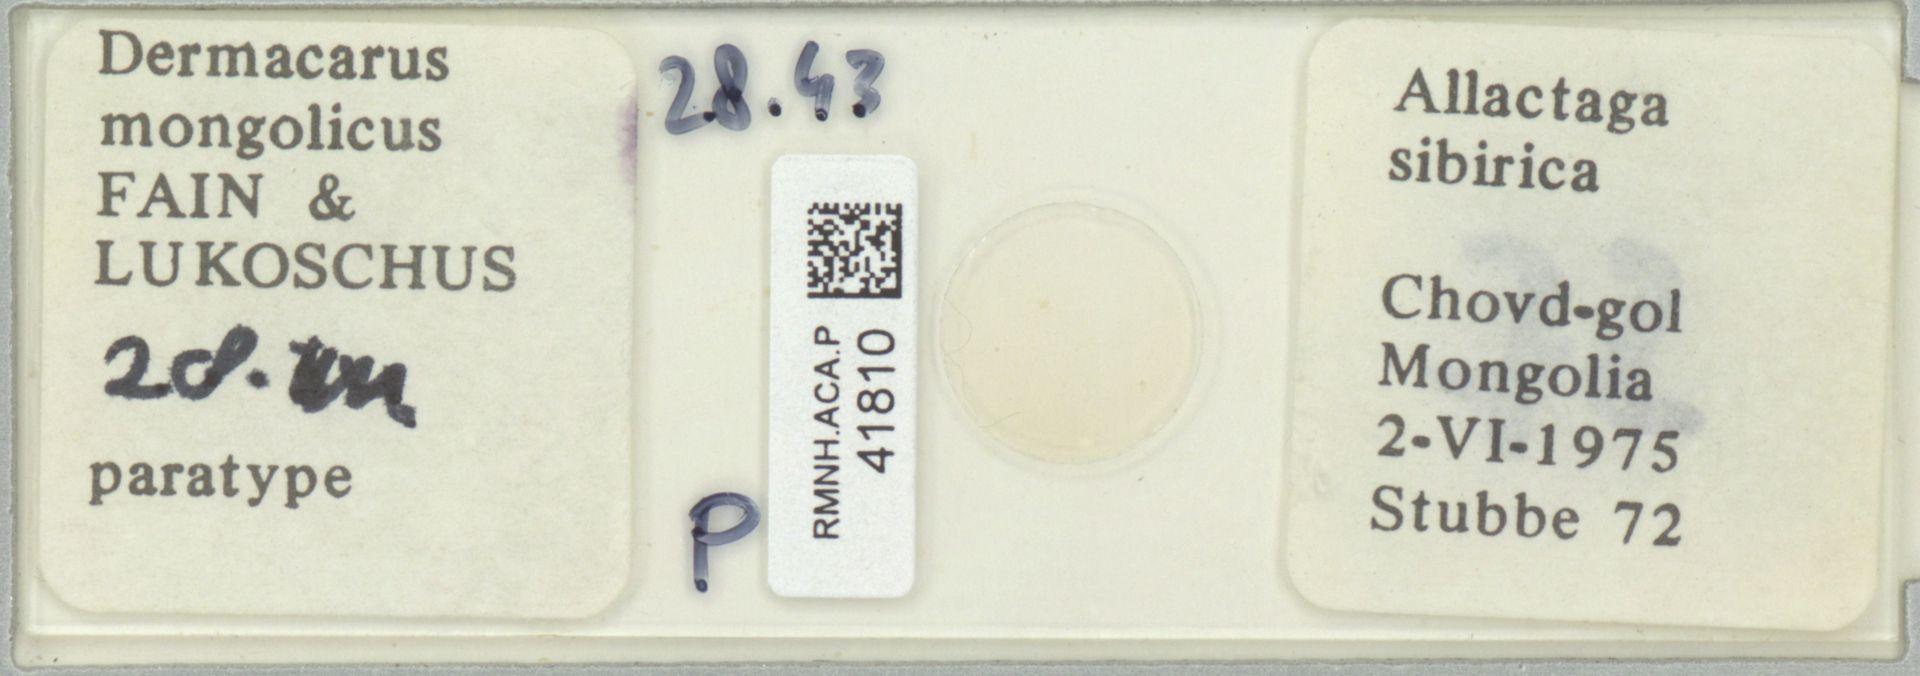 RMNH.ACA.P.41810 | Dermacarus mongolicus Fain & Lukoschus